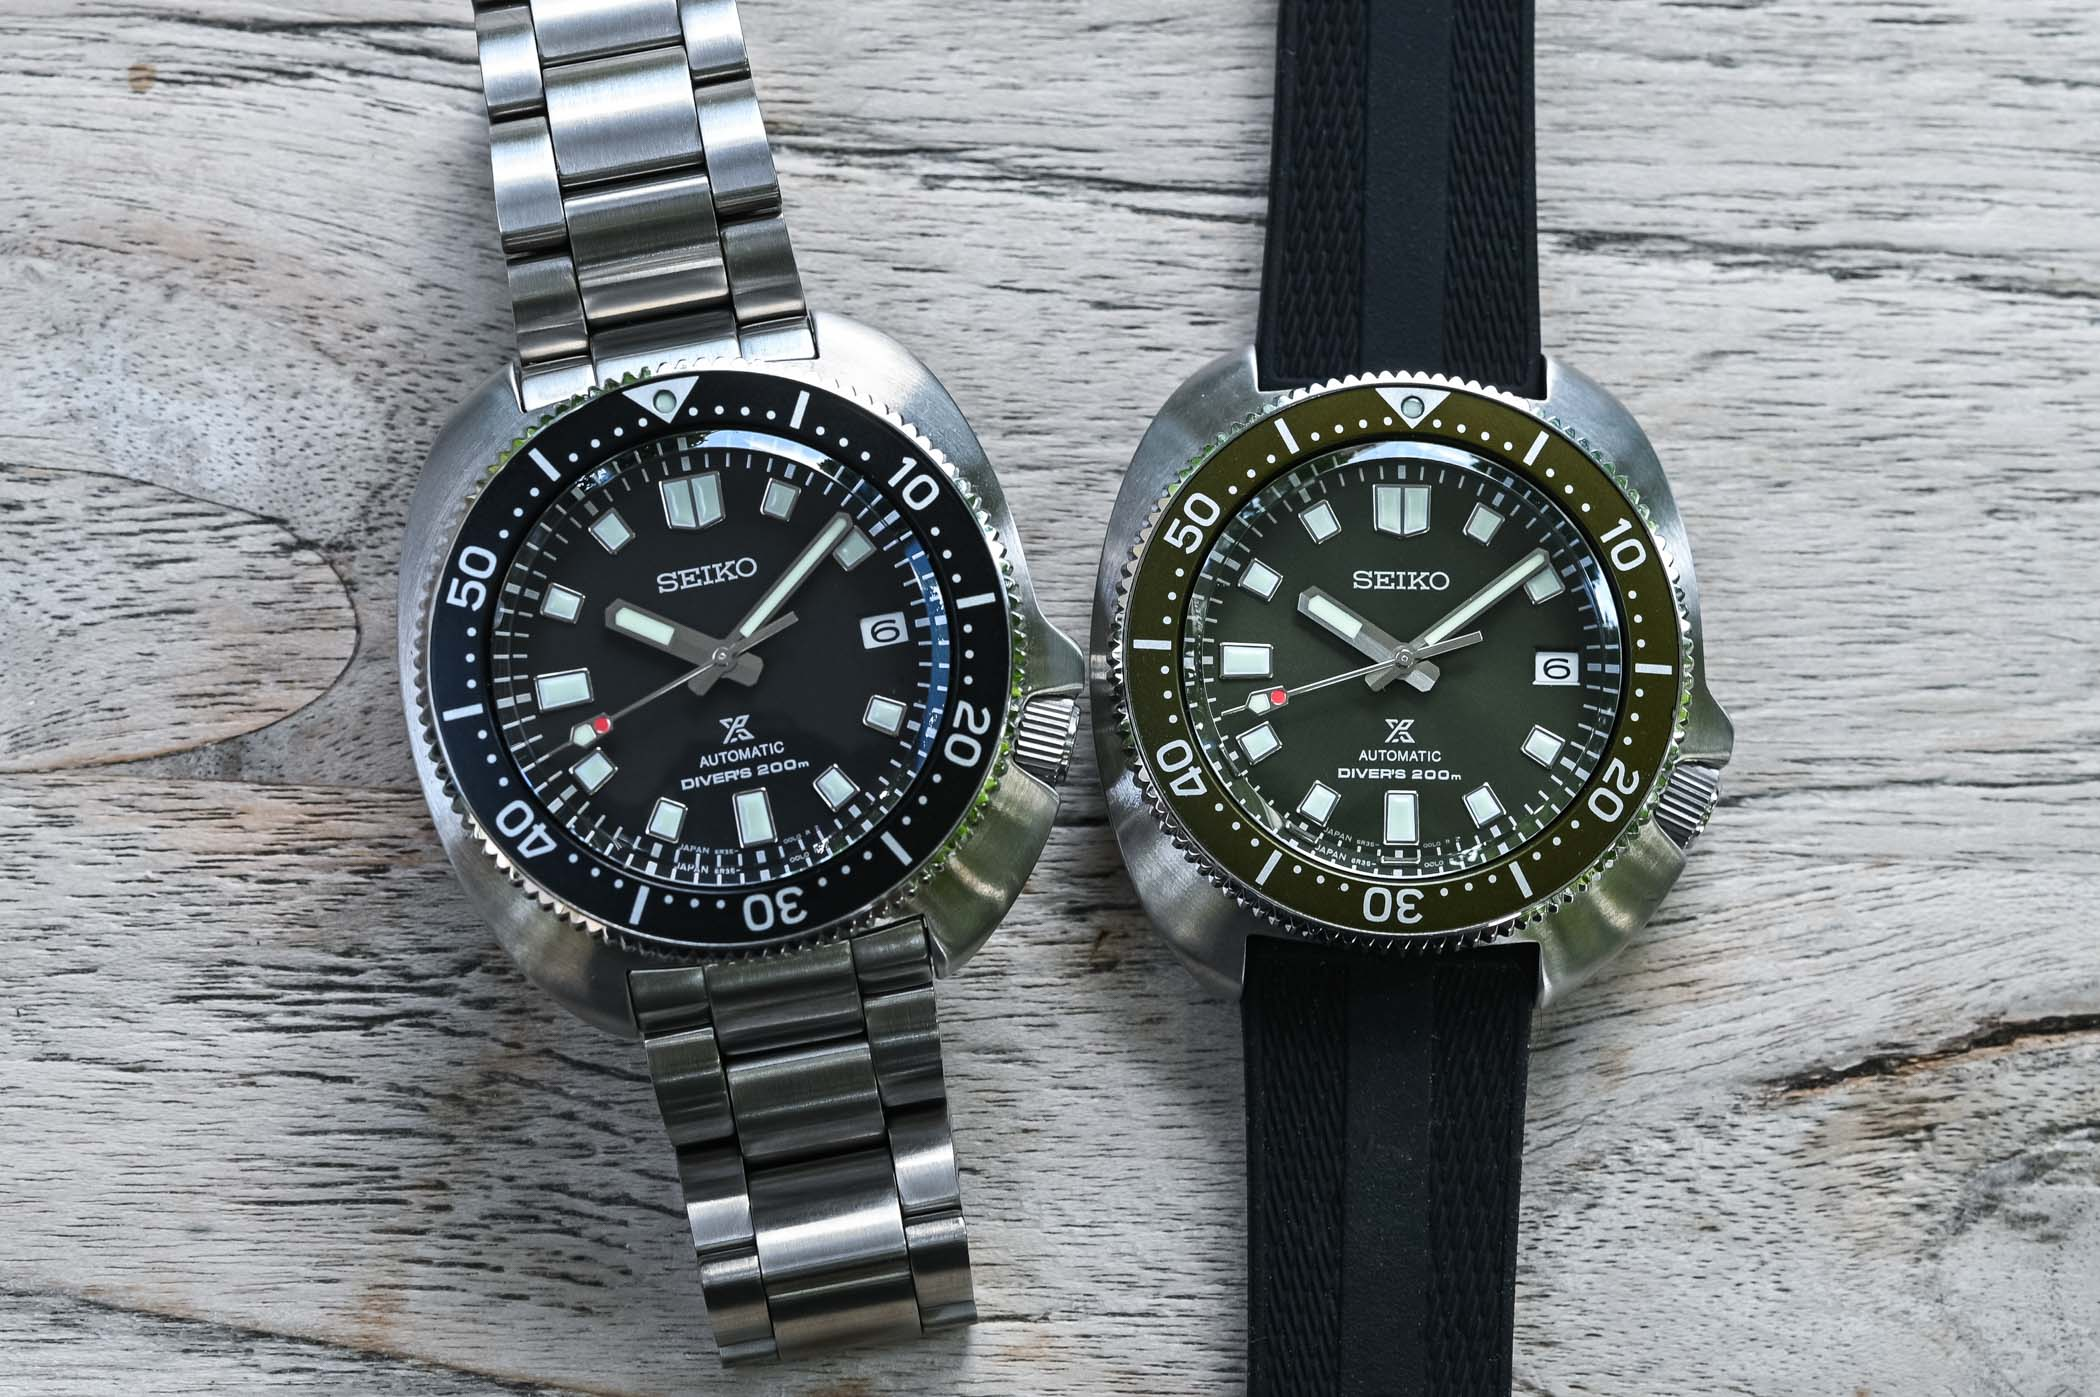 Seiko-Prospex-Diver-Captain-Willard-Turt